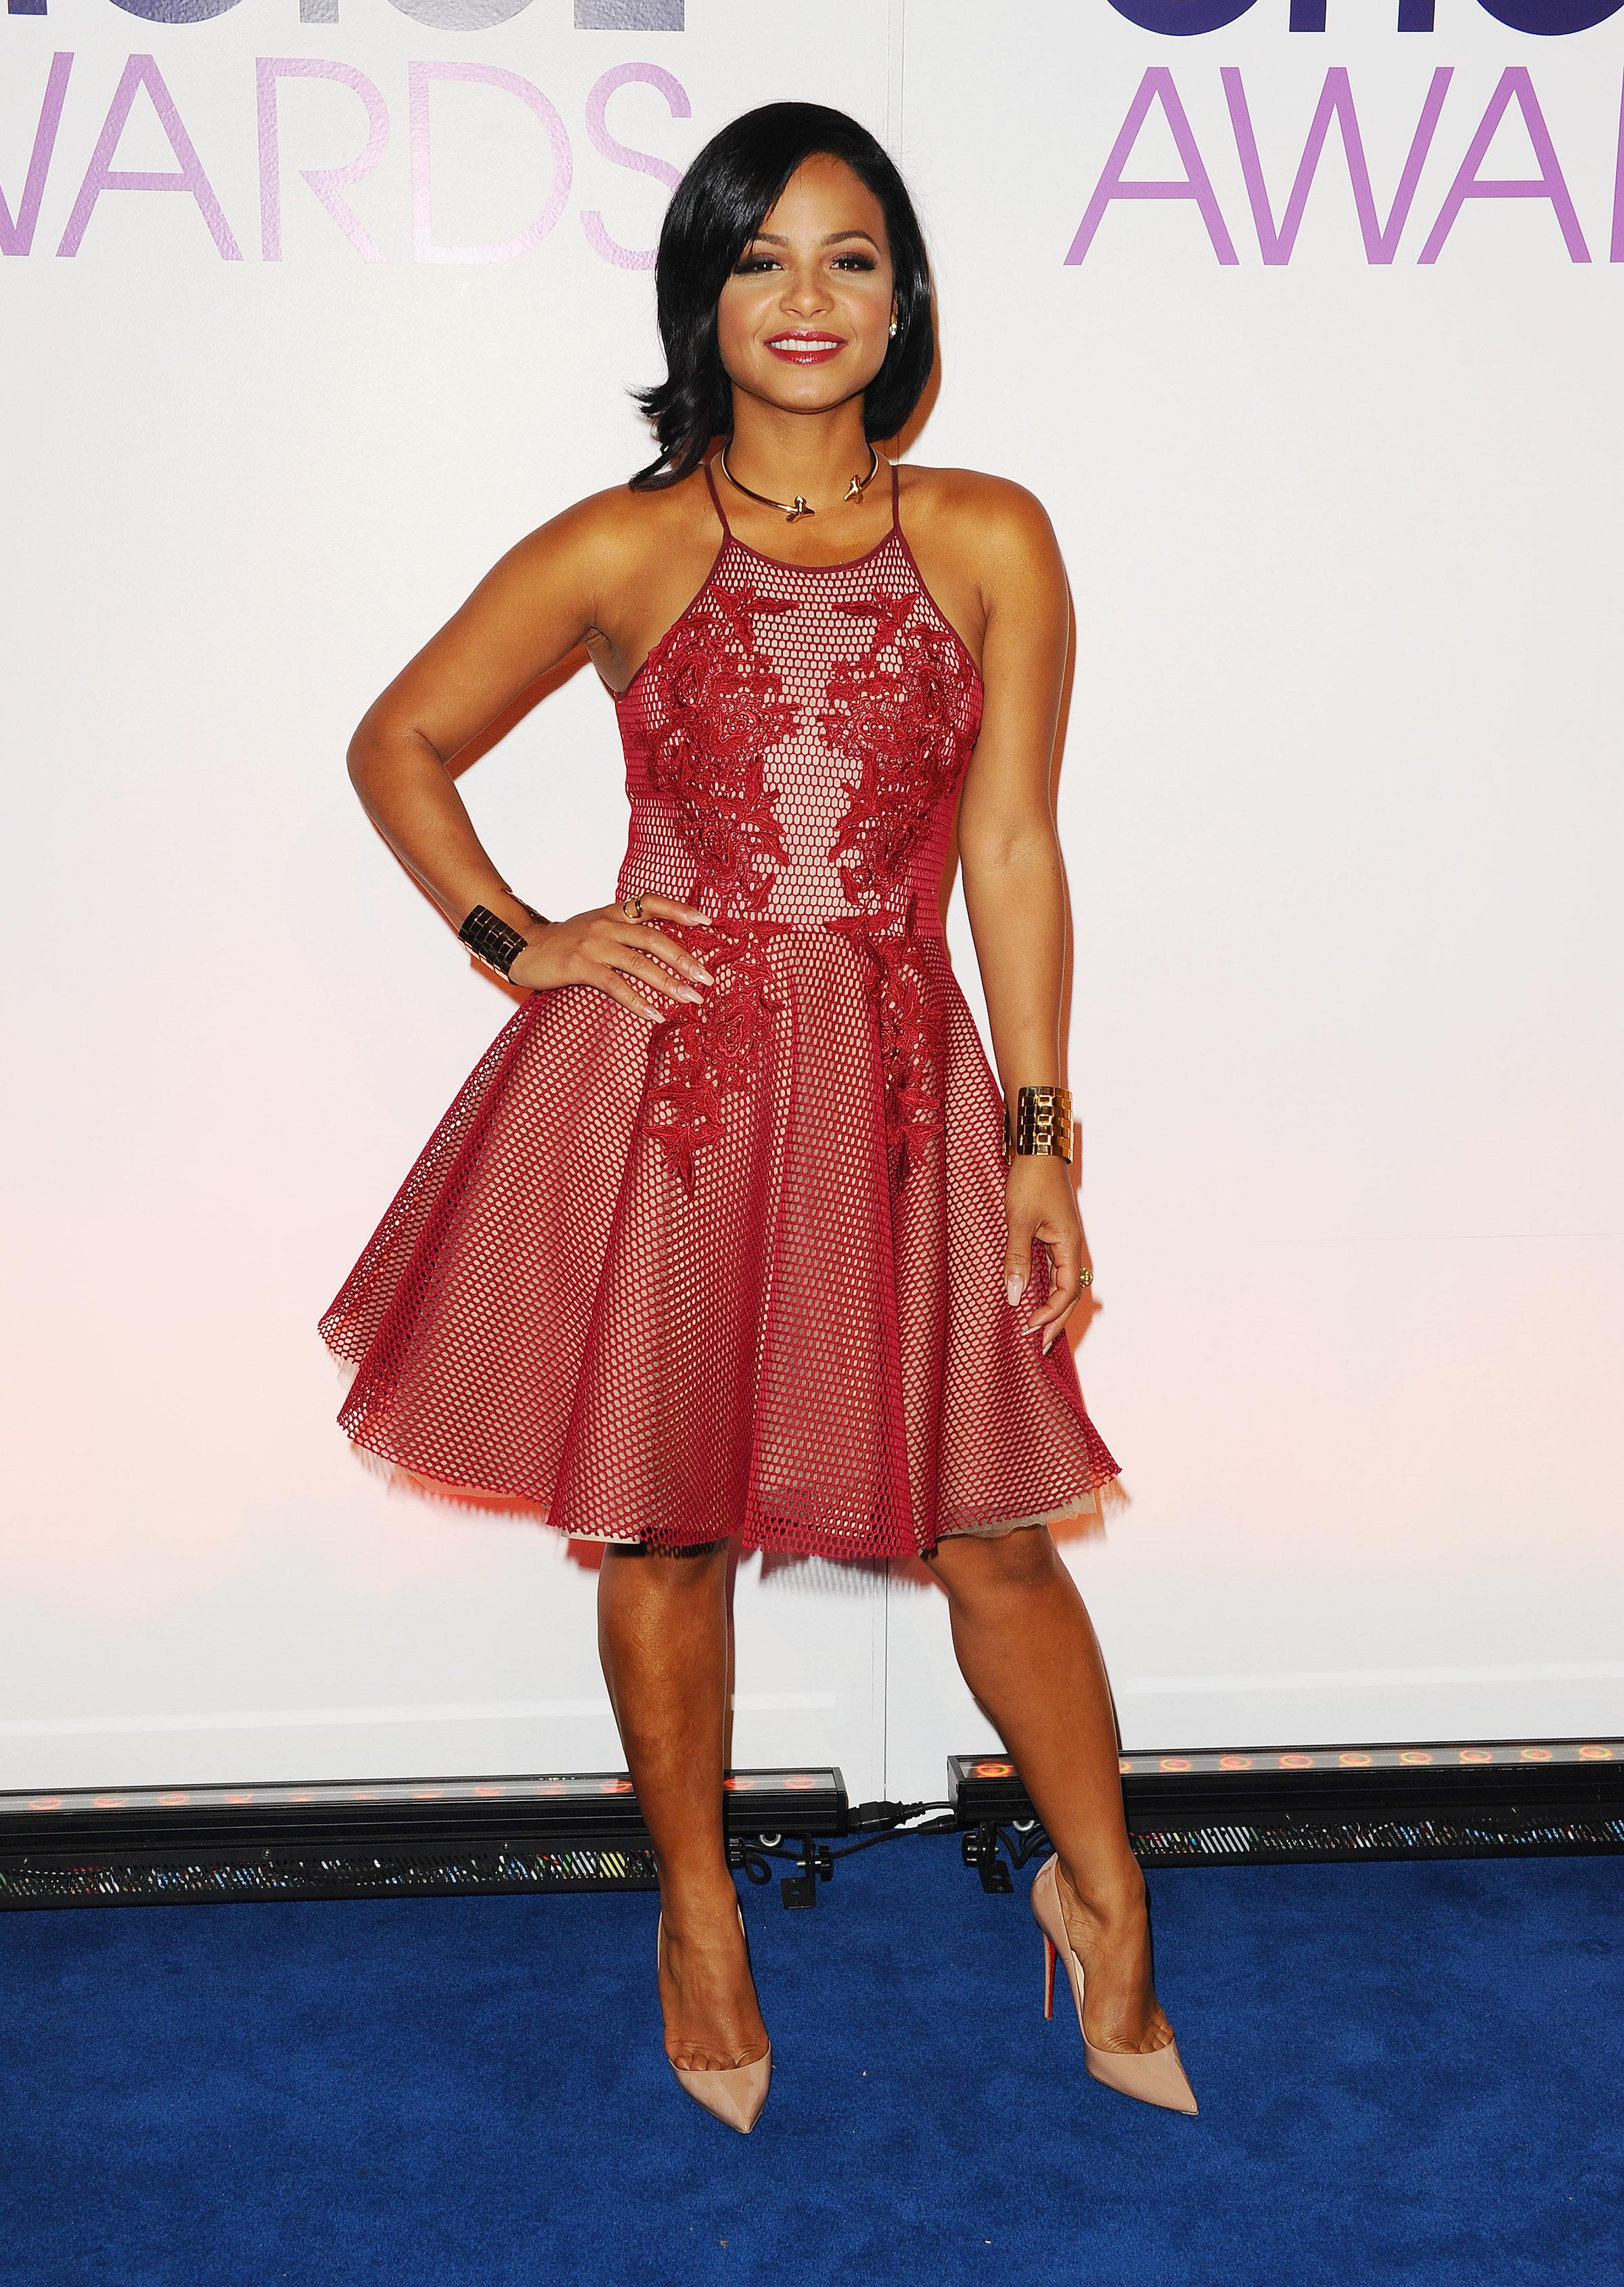 The Toe Cleavage Blog: Red dress - Christina Milian Christina Milian